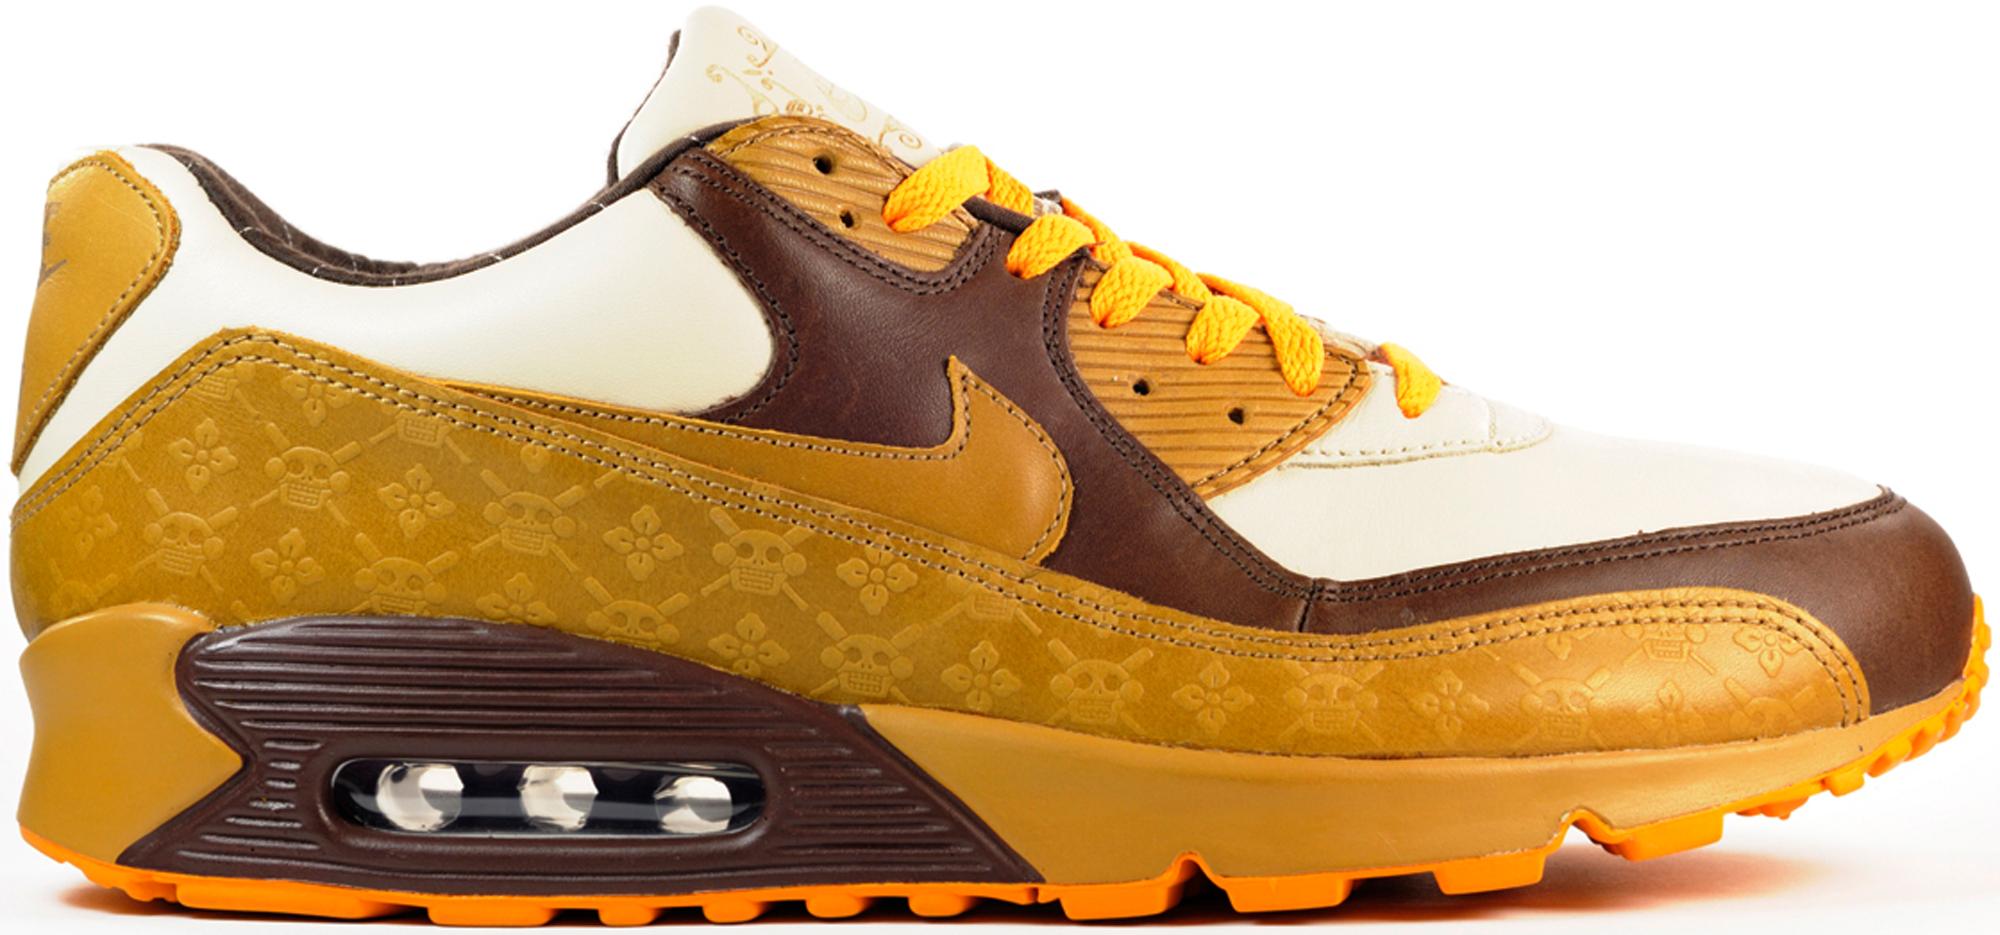 Nike Air Max 90 Wheat Skulls - 313650-271